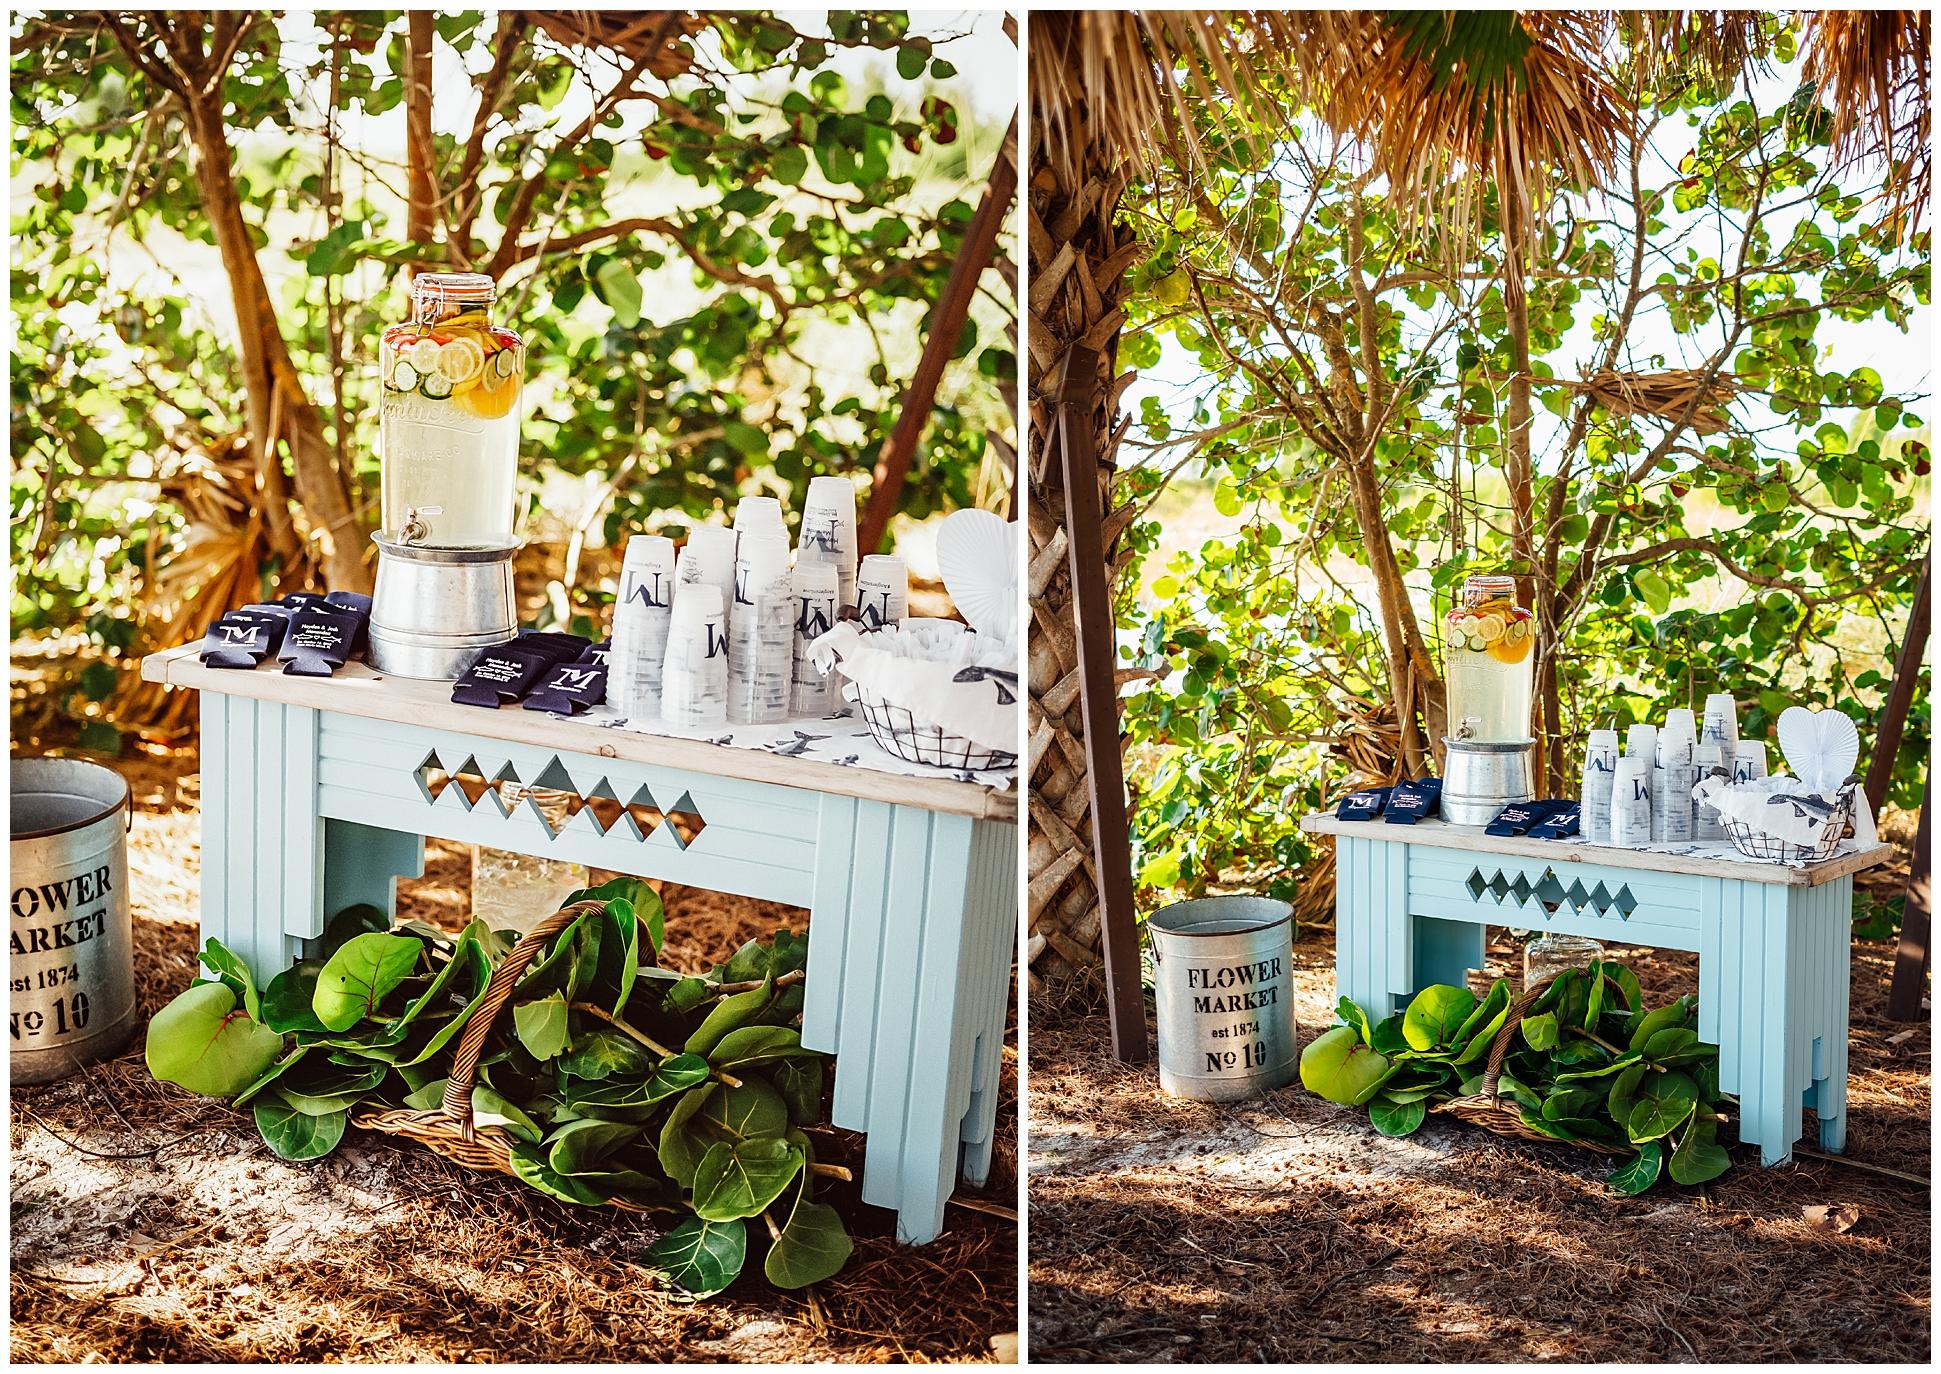 medium-format-film-vs-digital-wedding-photography-florida-beach_0010.jpg